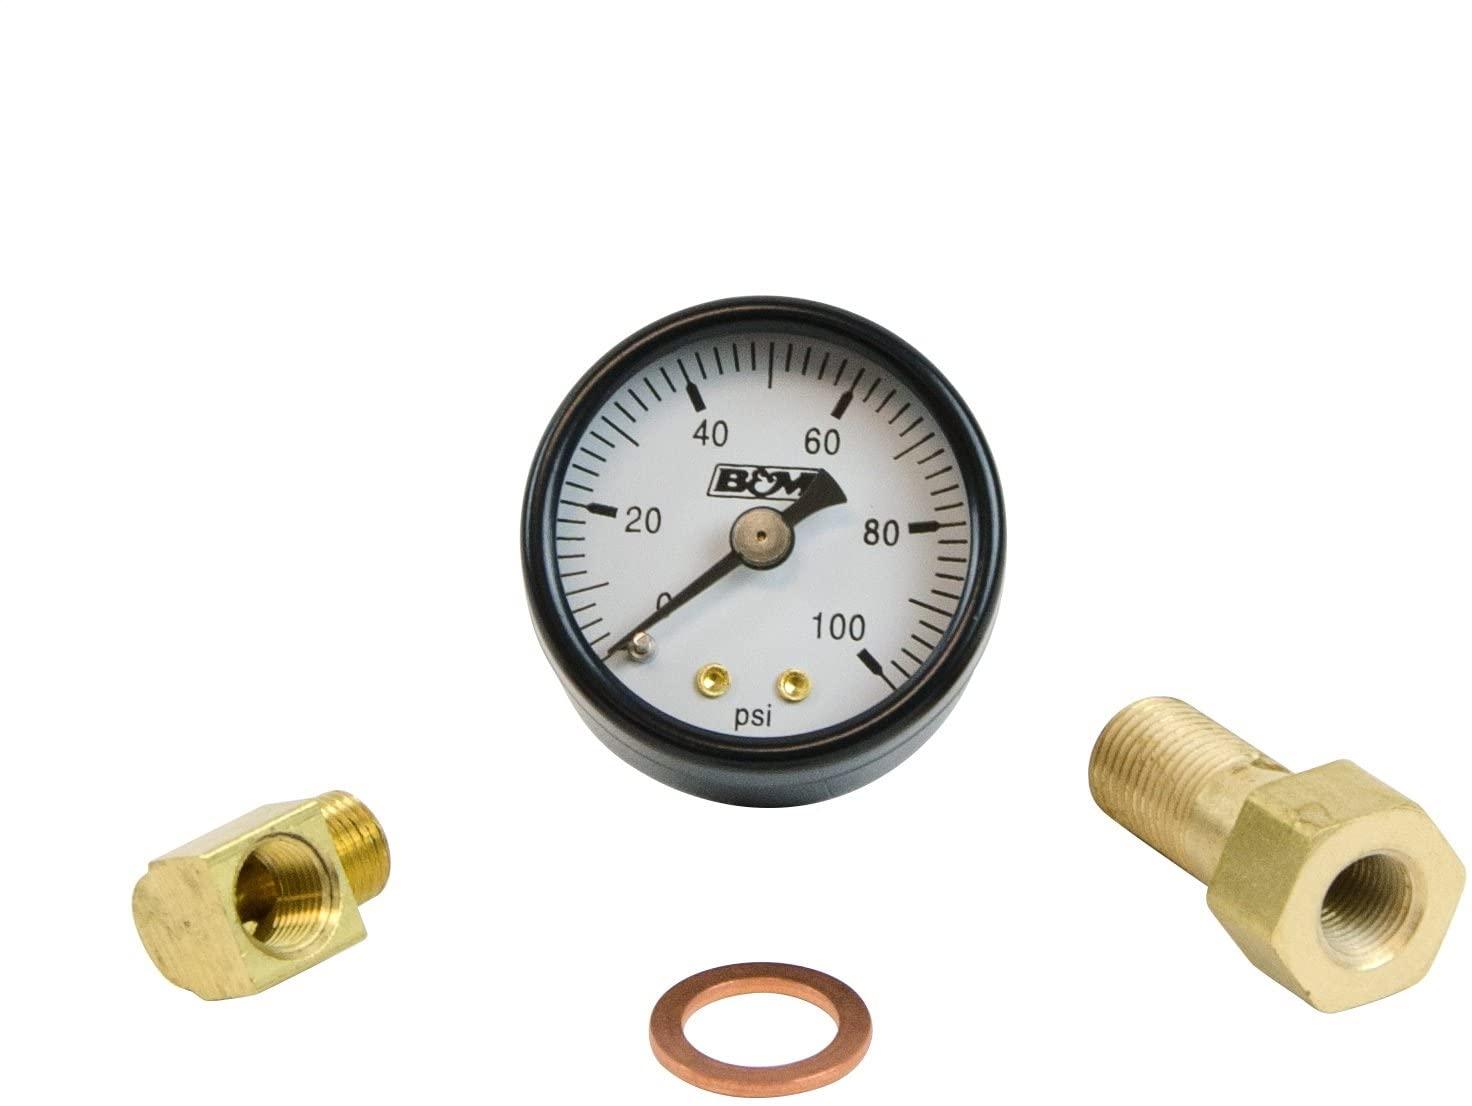 B&M 46054 Fuel Pressure Gauge Set